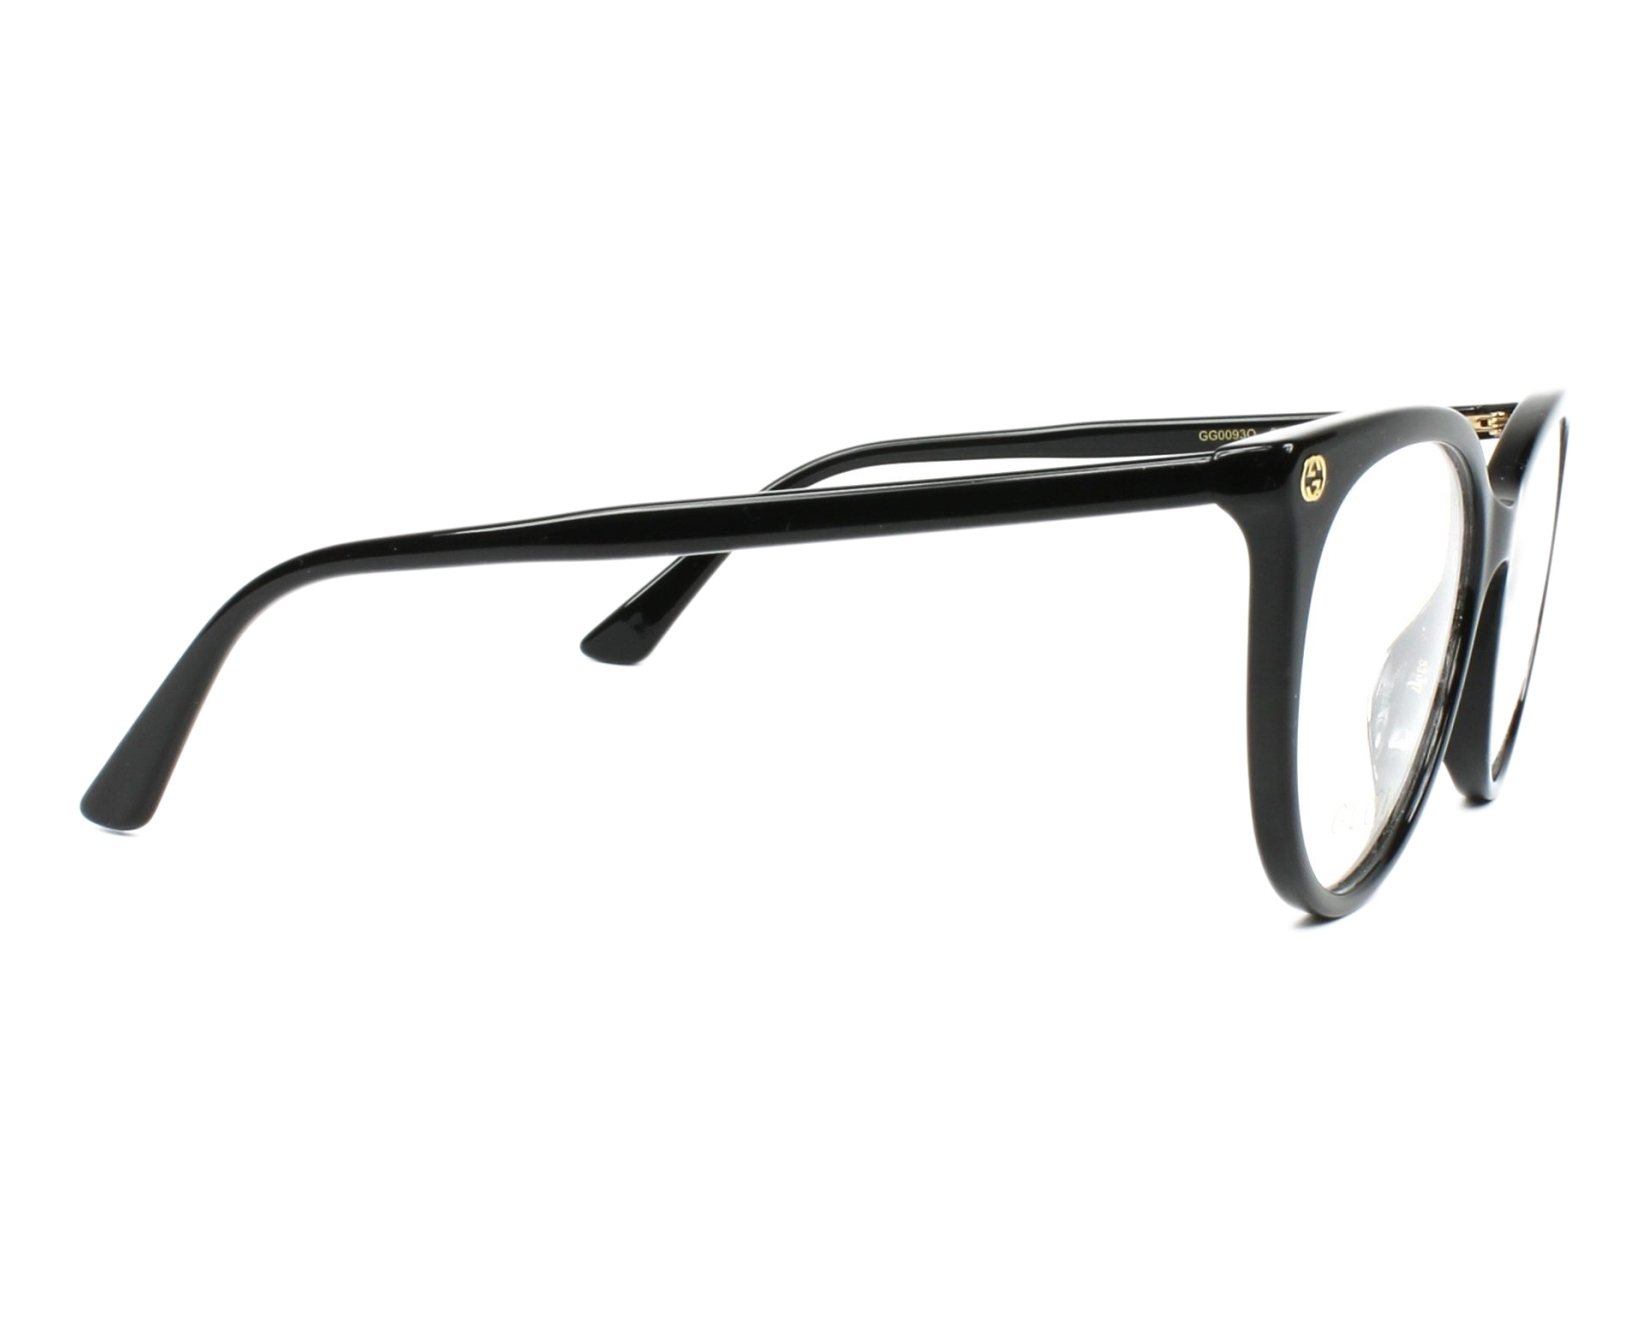 Eyeglasses gucci black side view jpg 1650x1320 Gucci frame de9d6d39efb